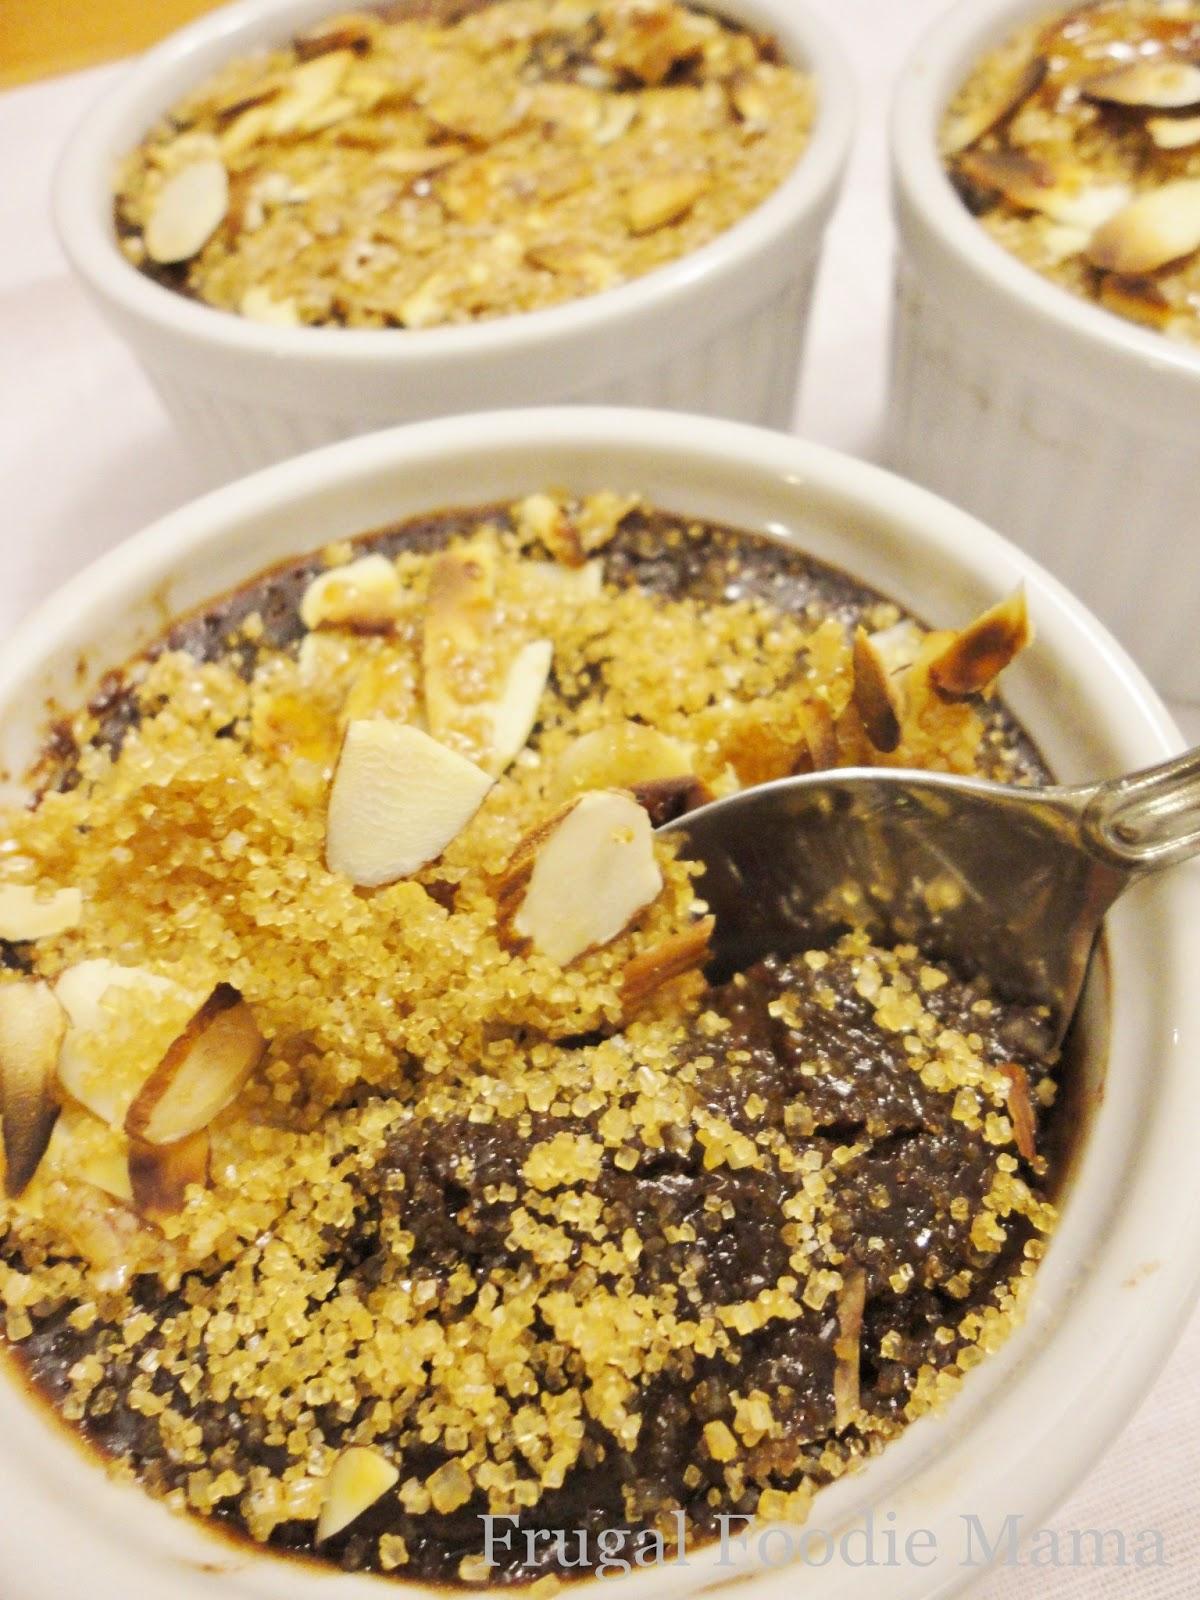 Frugal Foodie Mama: Triple Chocolate Almond Creme Brulee